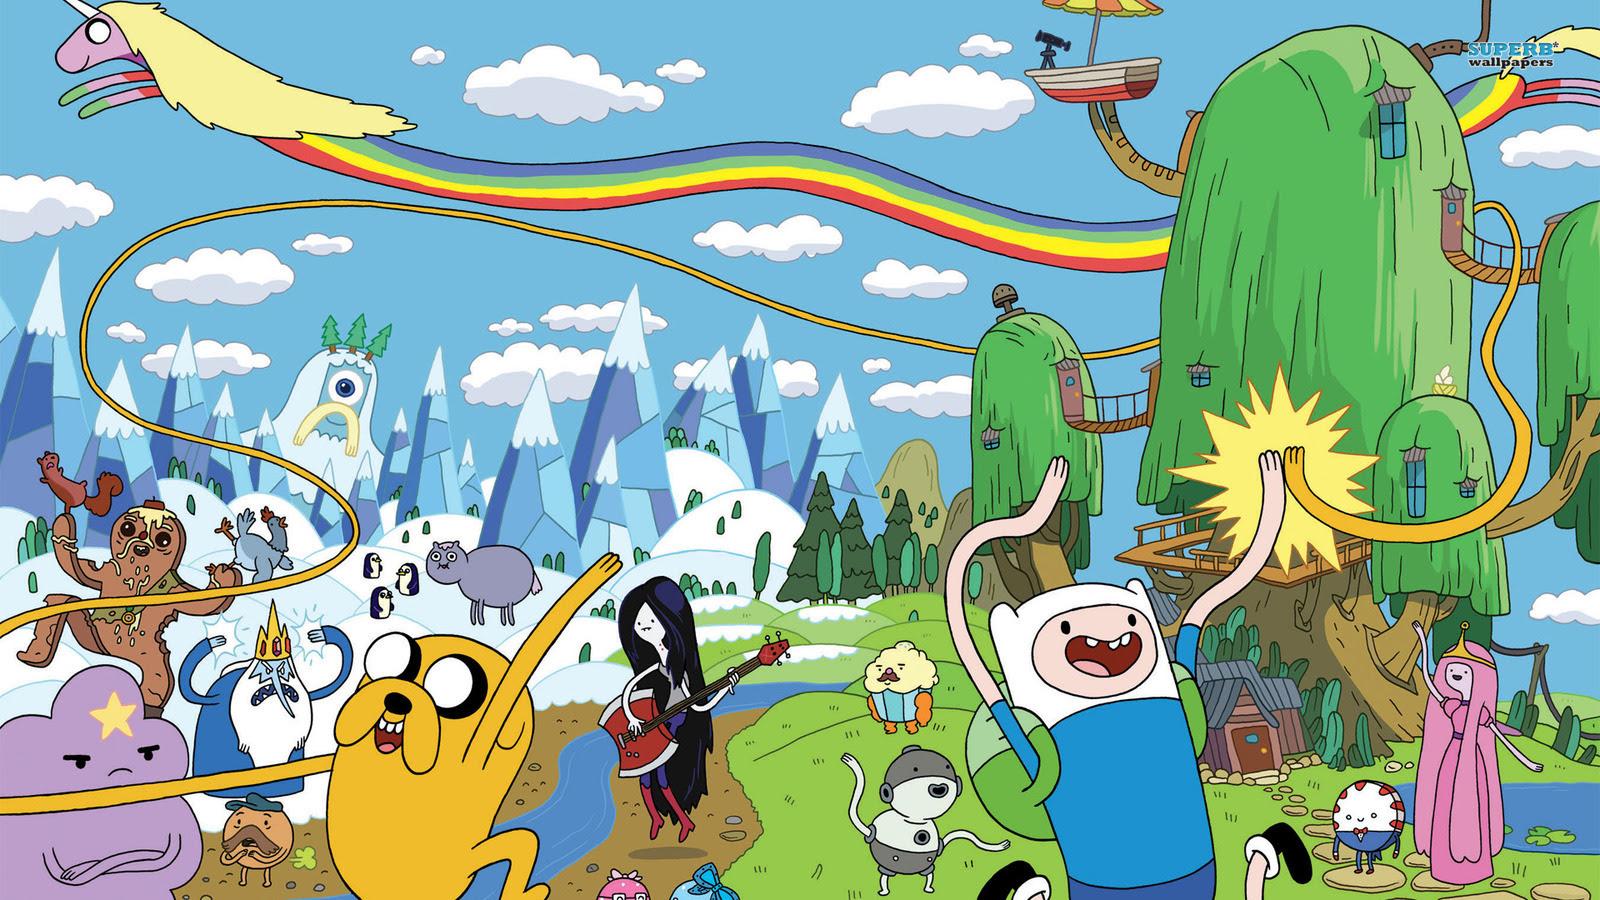 Anime Kawaii Adventure Time Wallpaper